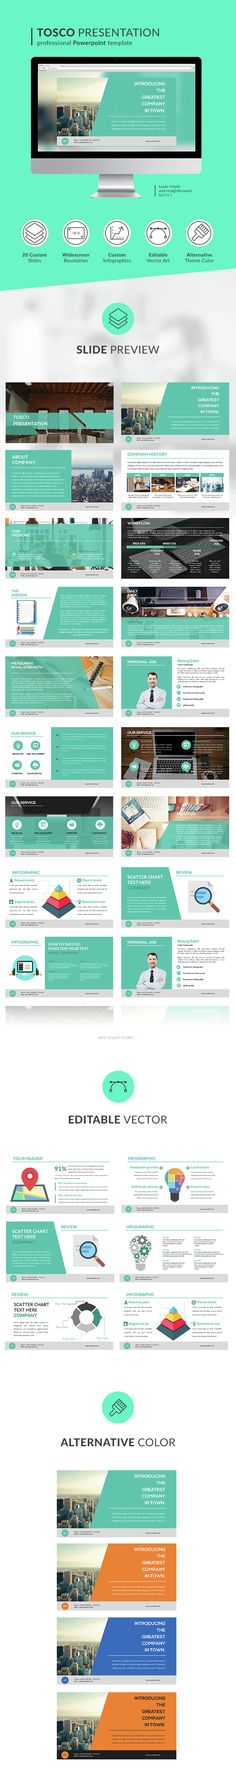 h2 plus multipurpose powerpoint presentation template | http://www, Presentation templates